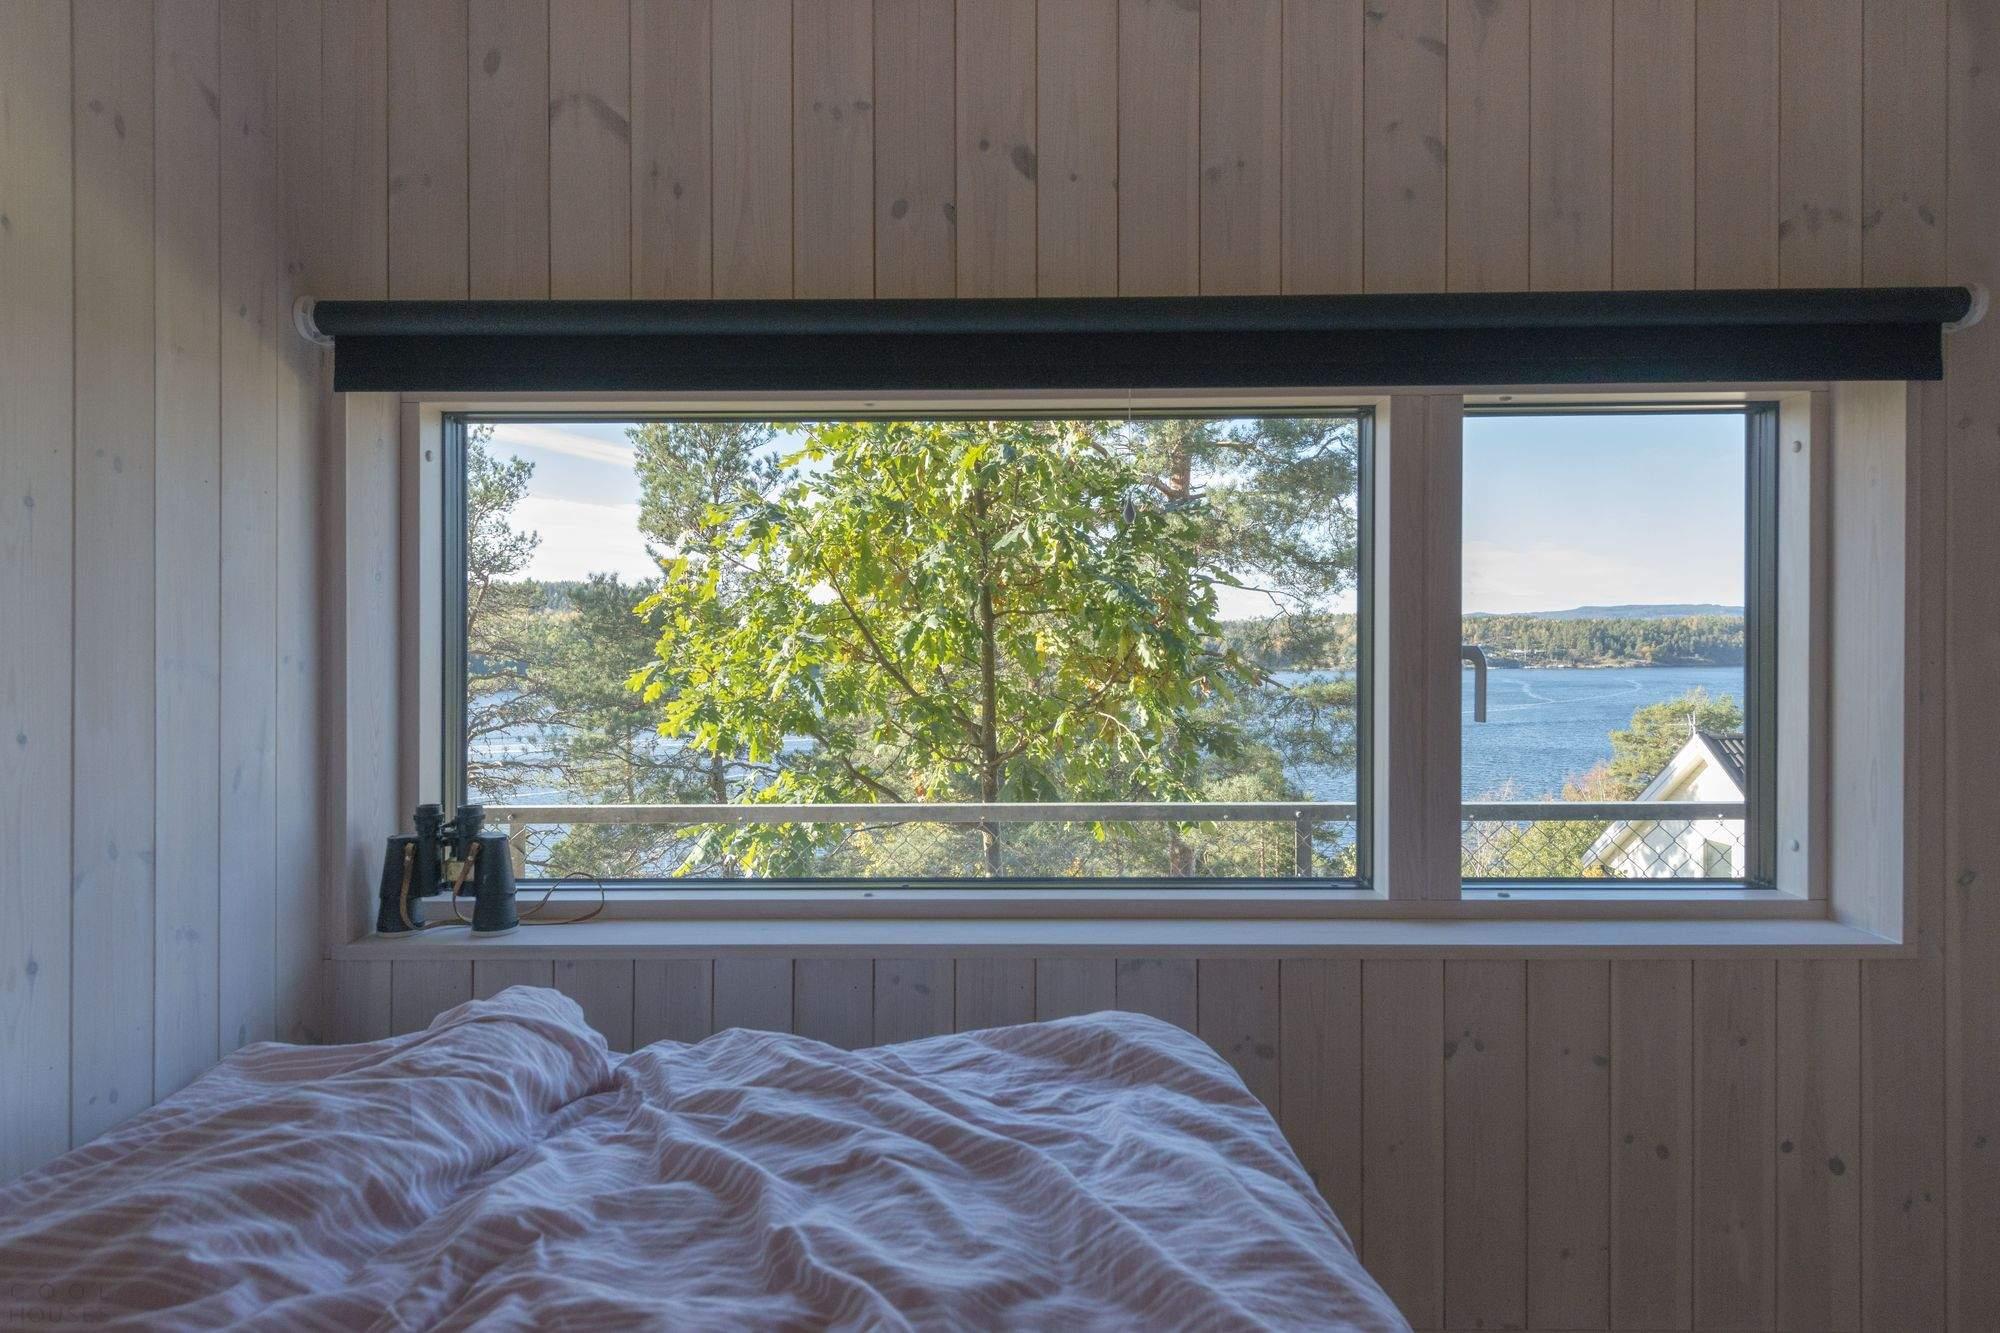 Загородный коттедж на берегу залива, Норвегия